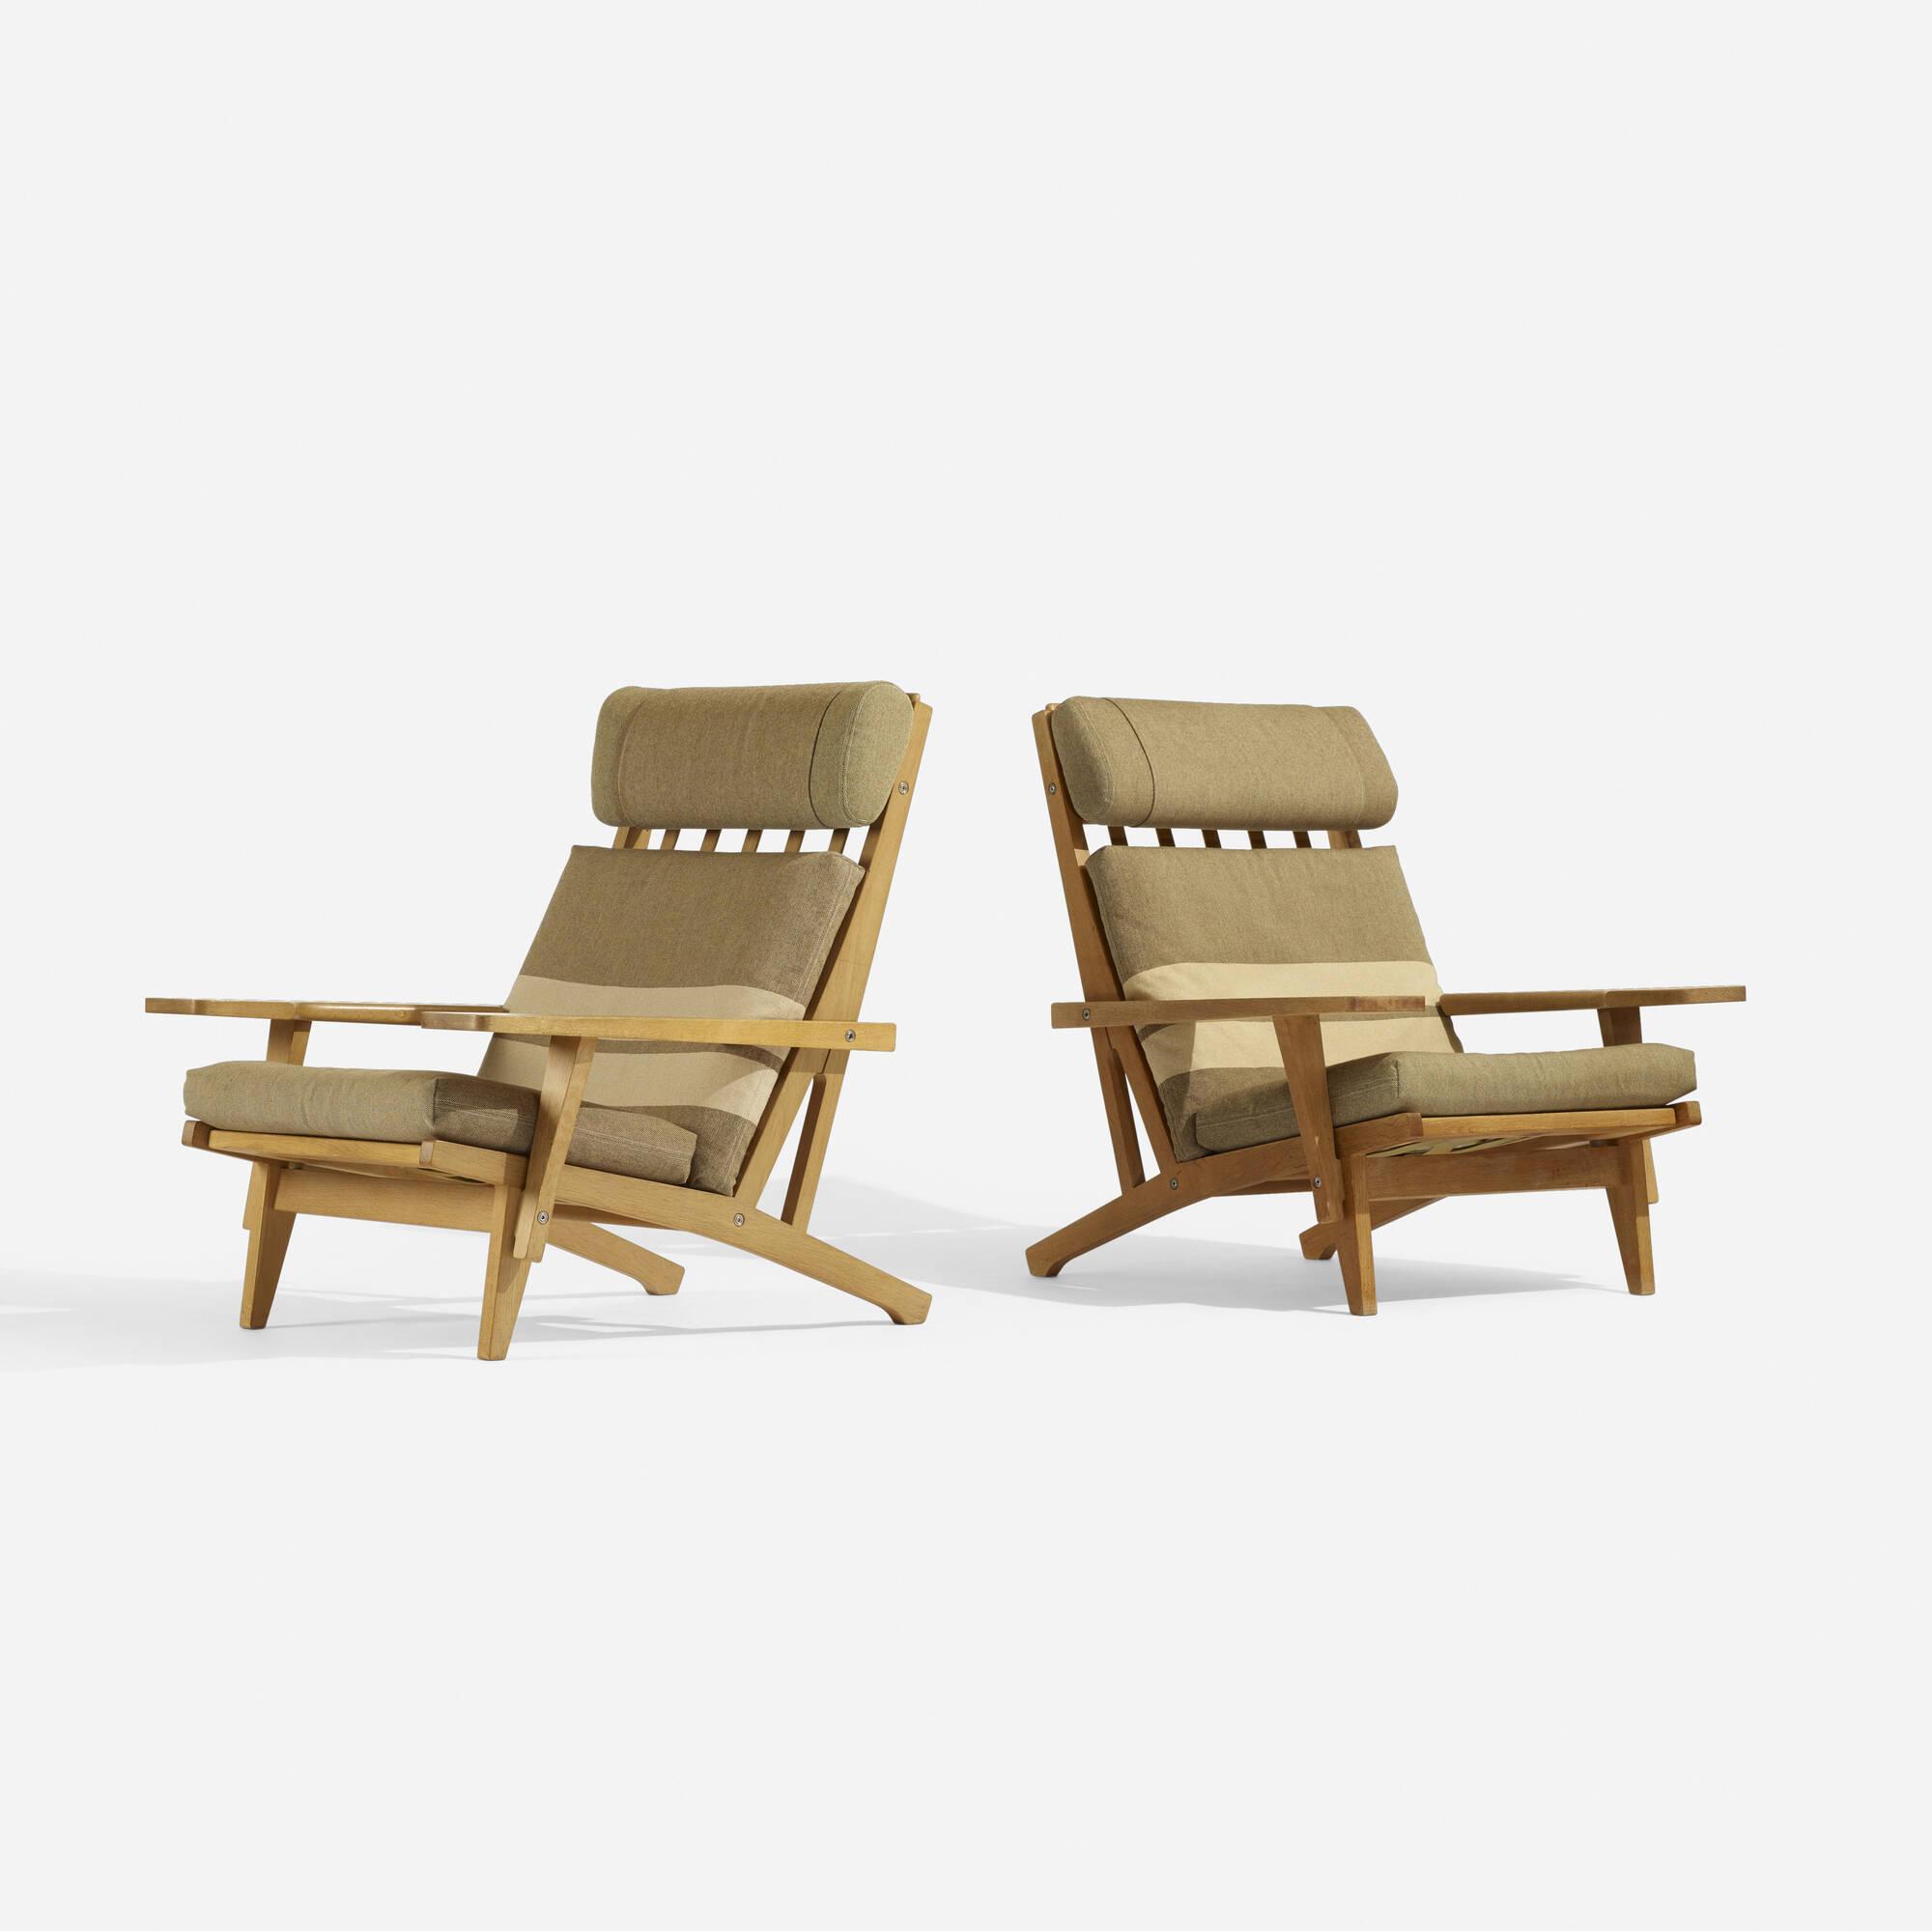 288: Hans J. Wegner / lounge chairs model GE375, pair (3 of 4)